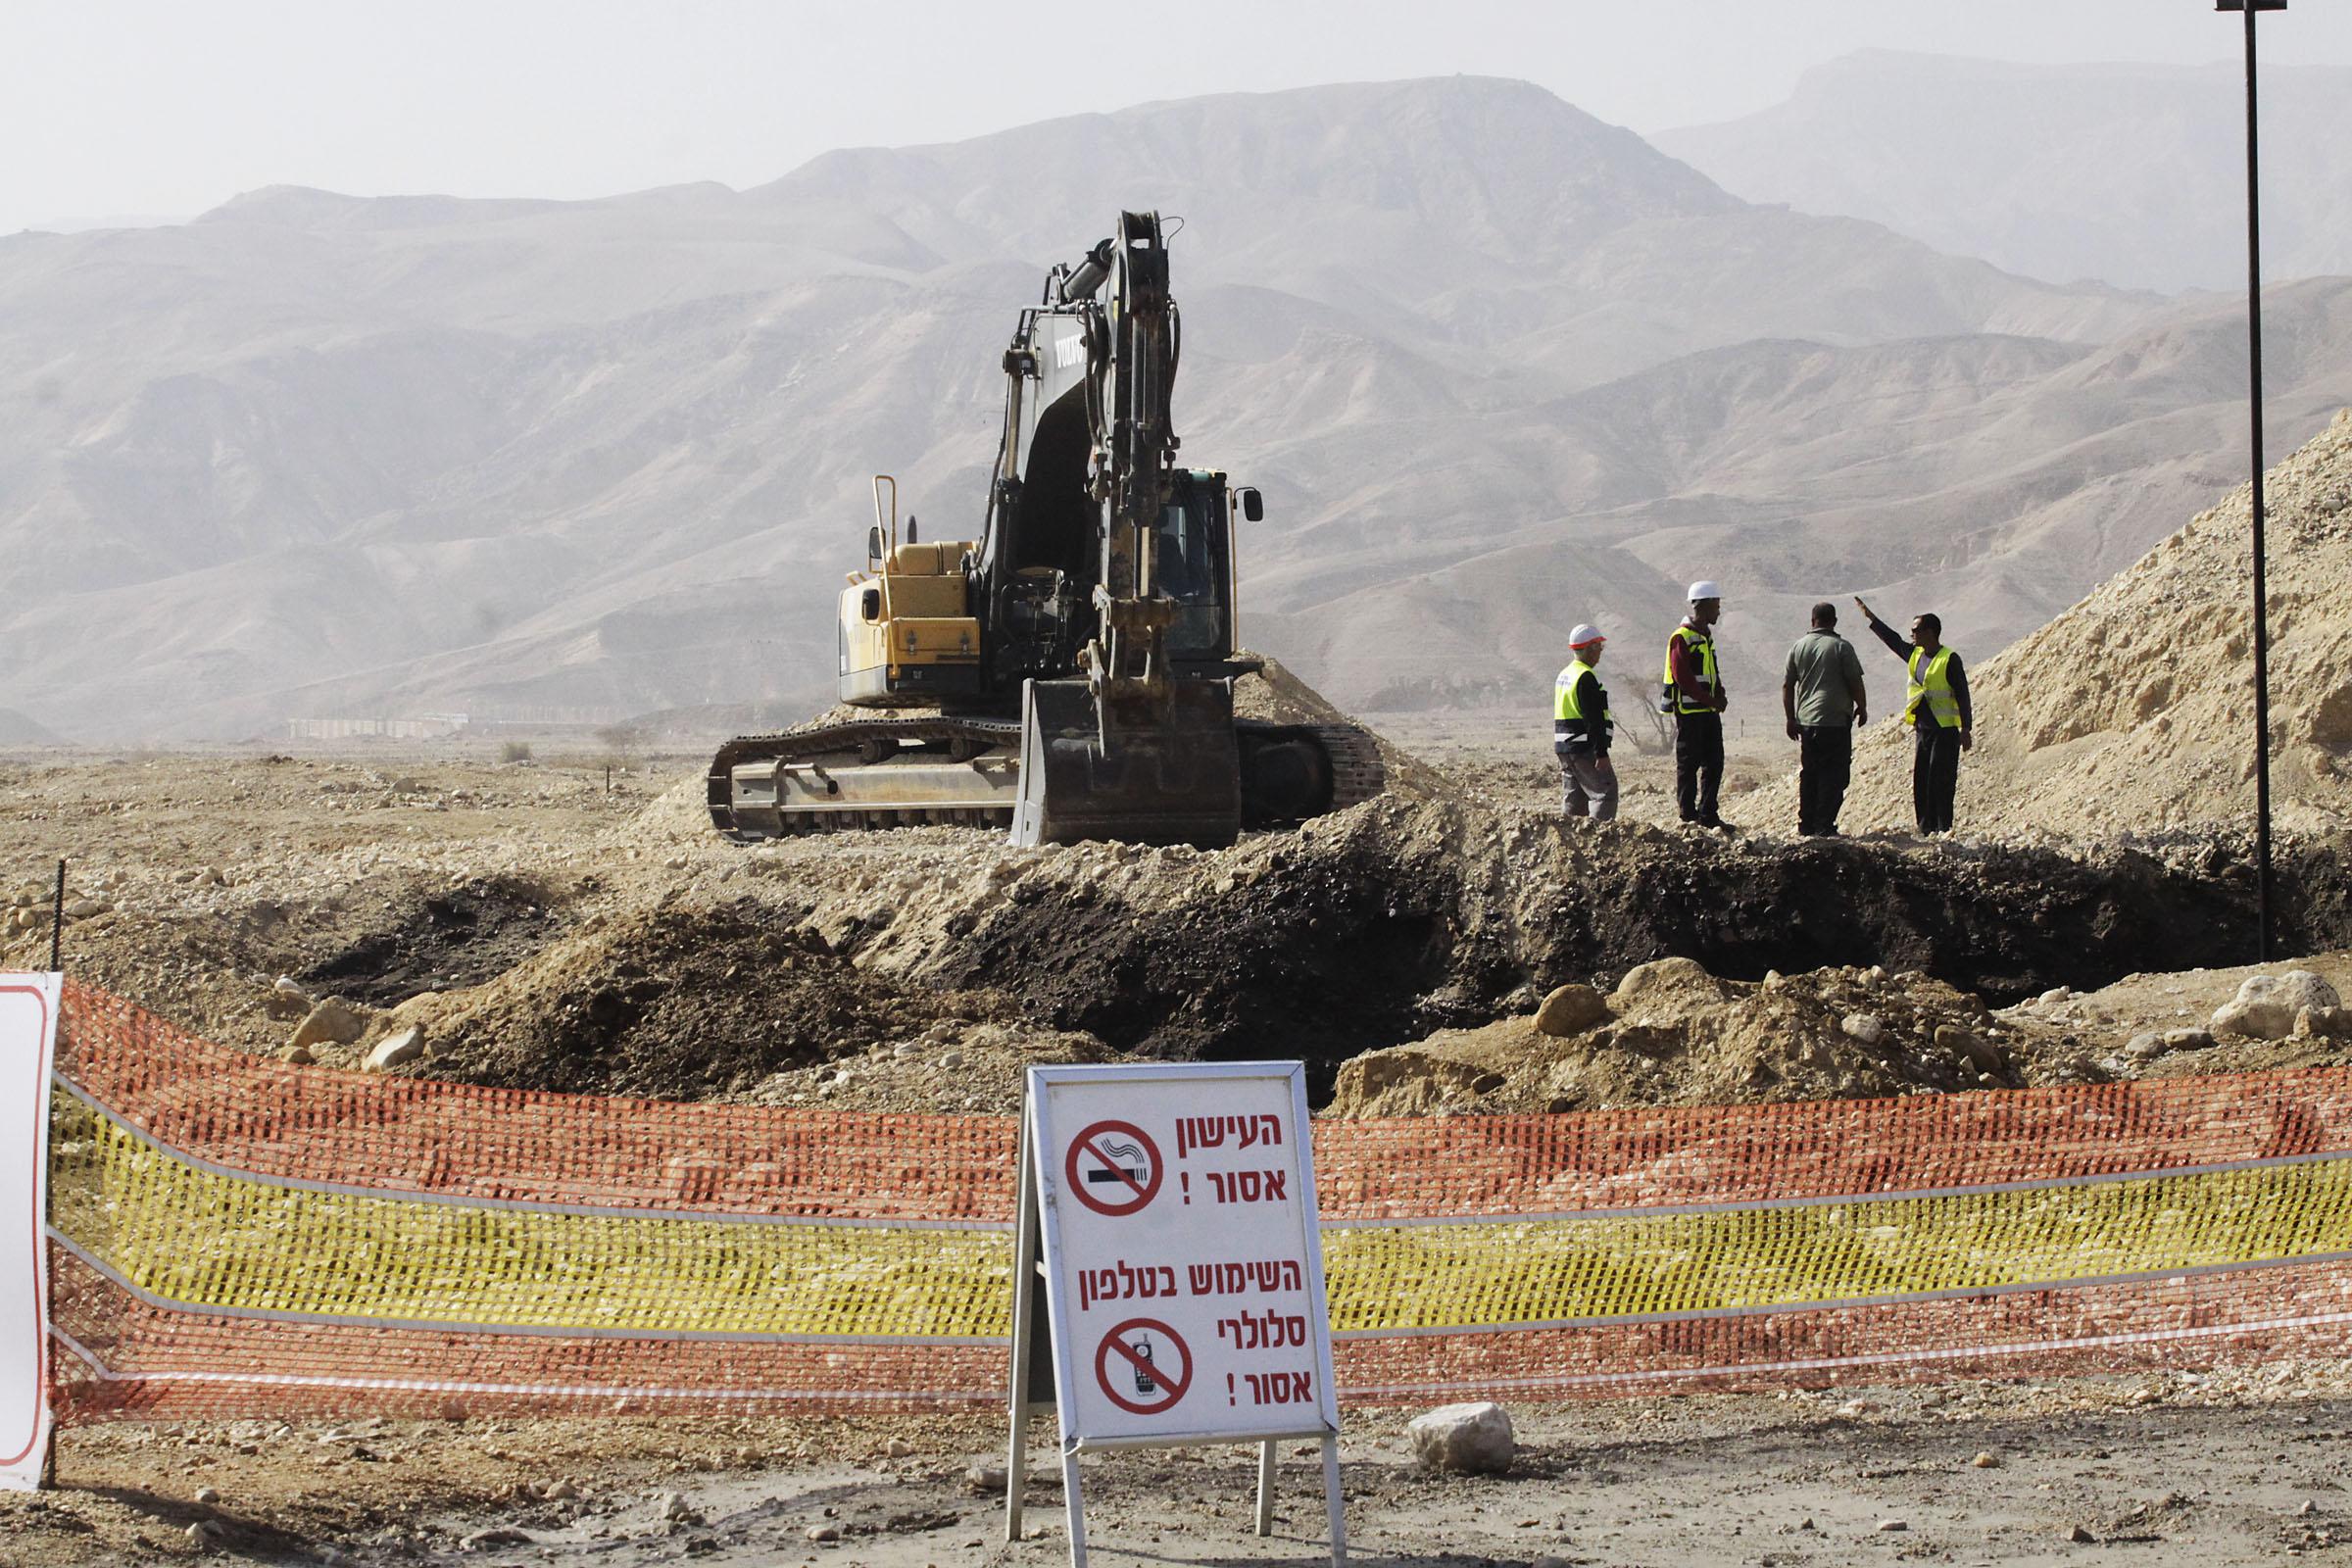 Catastrophic Negev Oil Spill